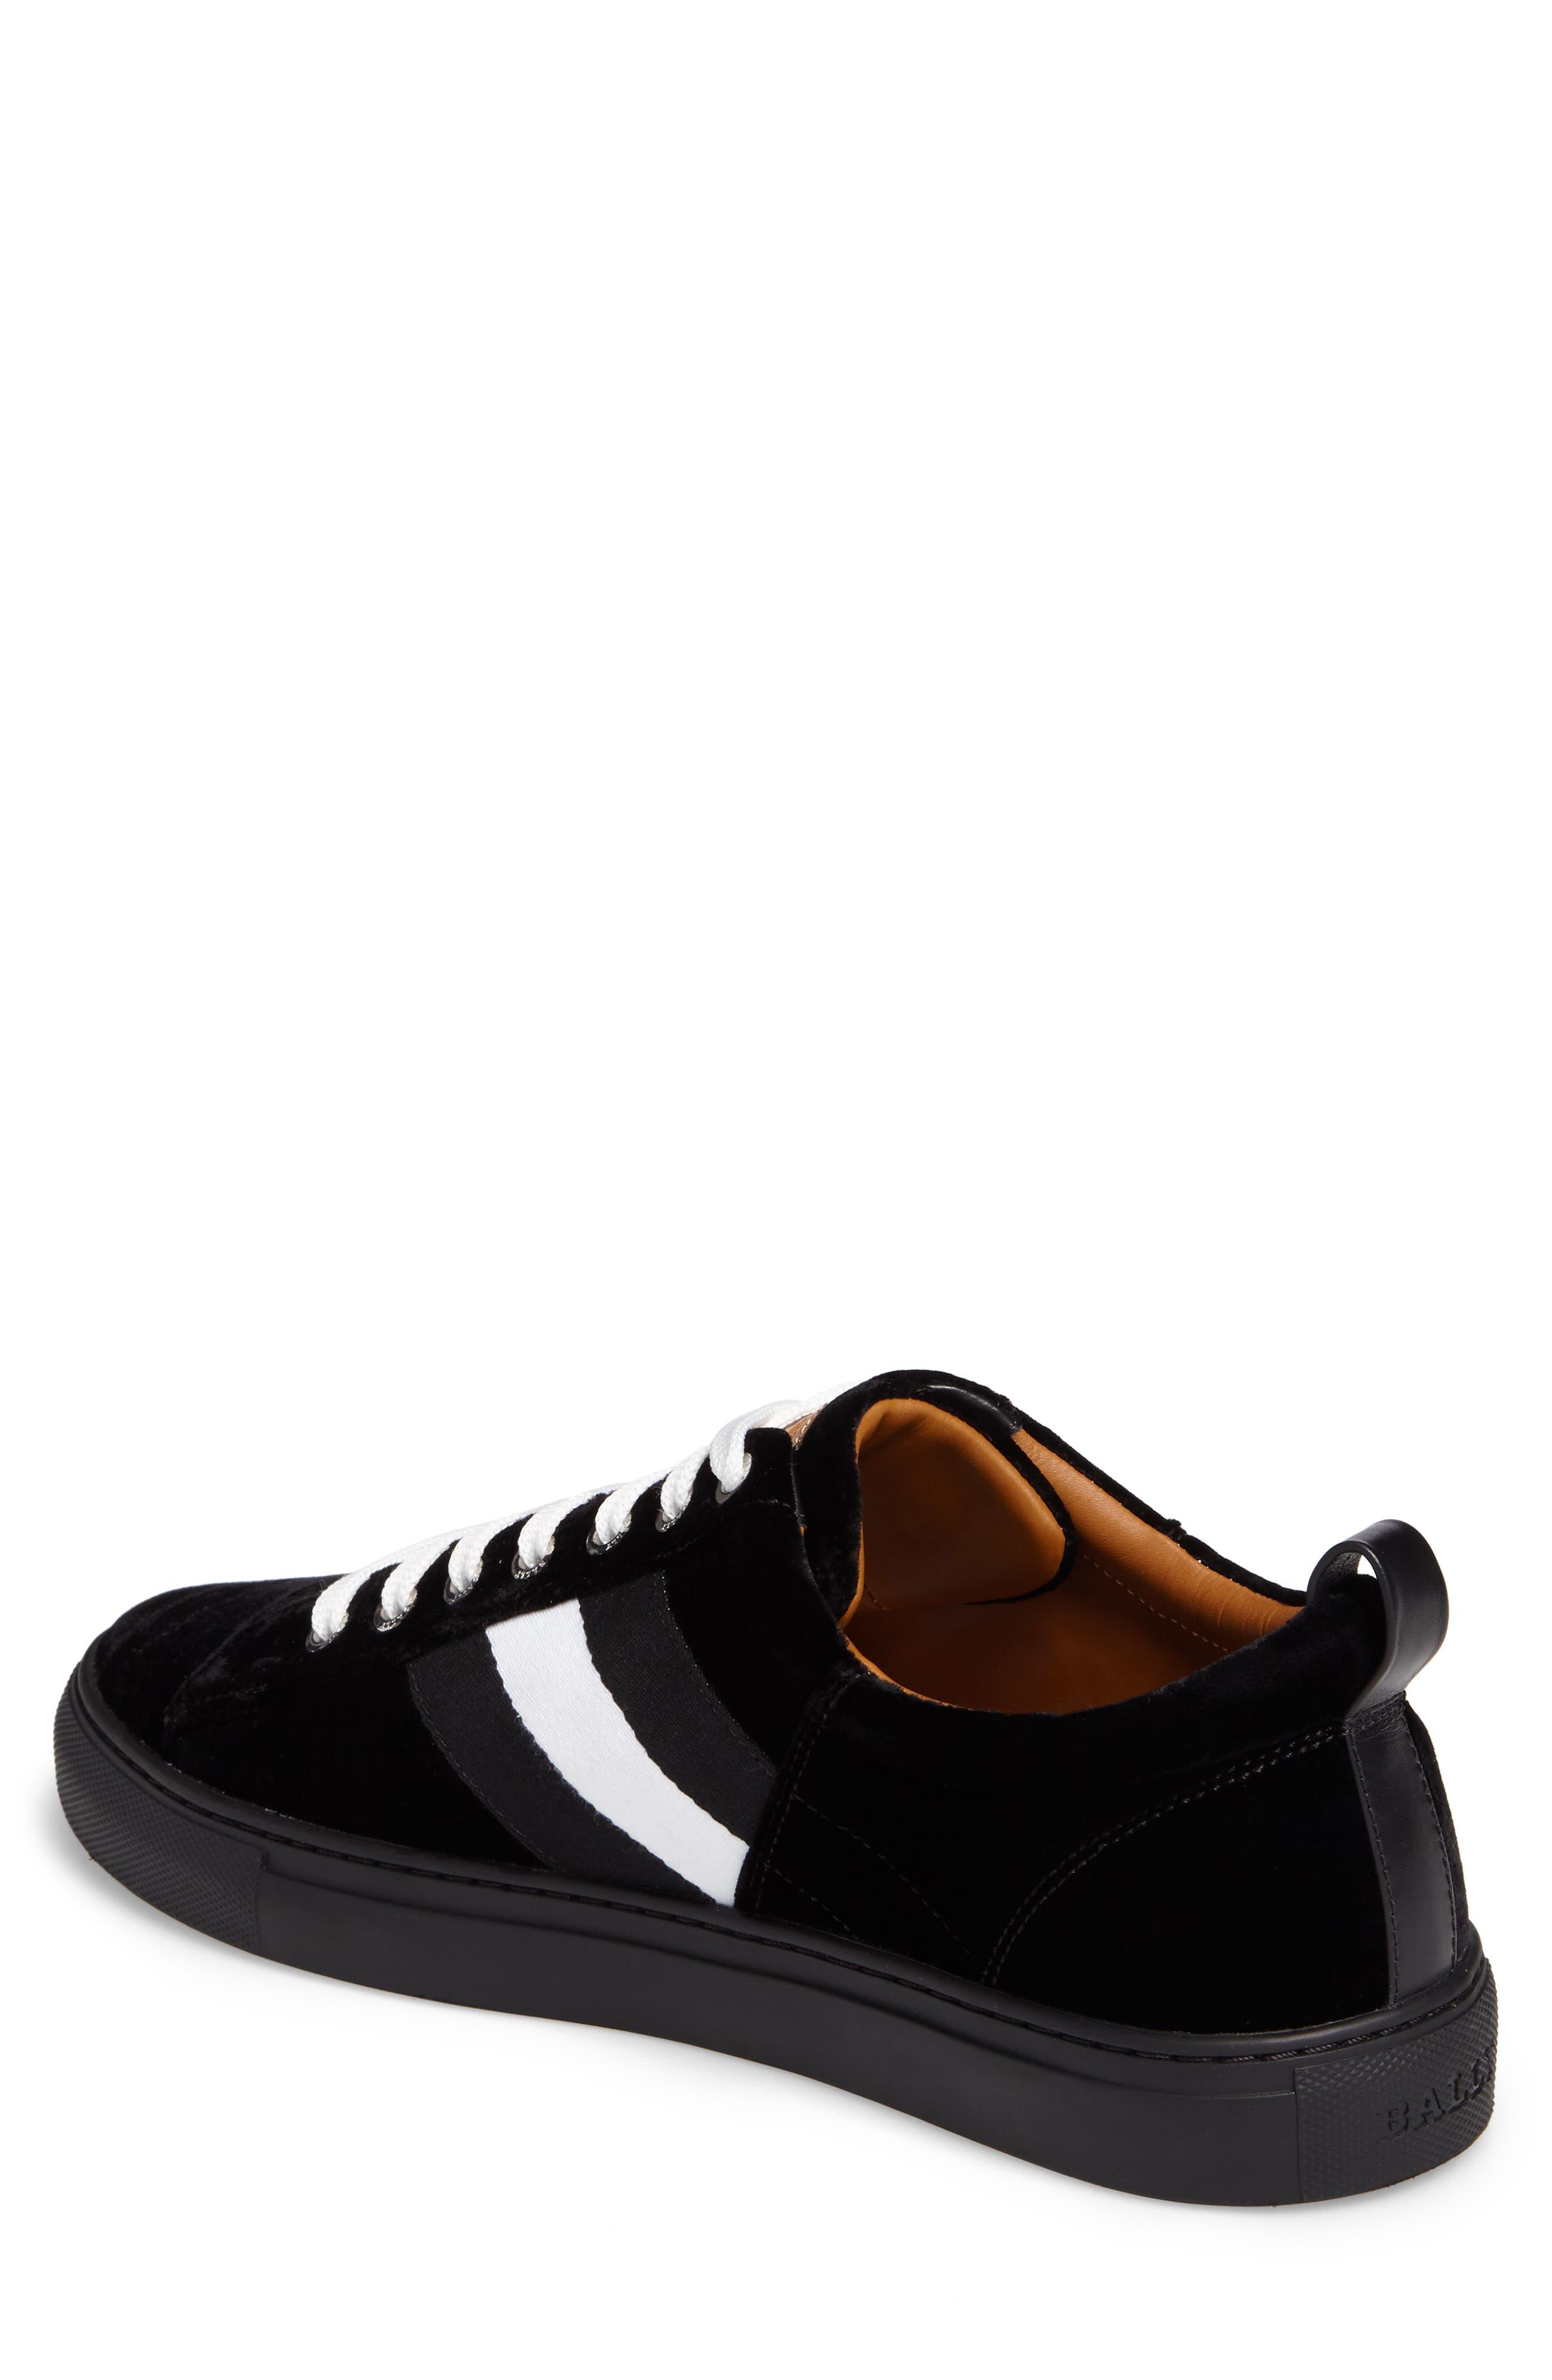 'Helvio' Sneaker,                             Alternate thumbnail 7, color,